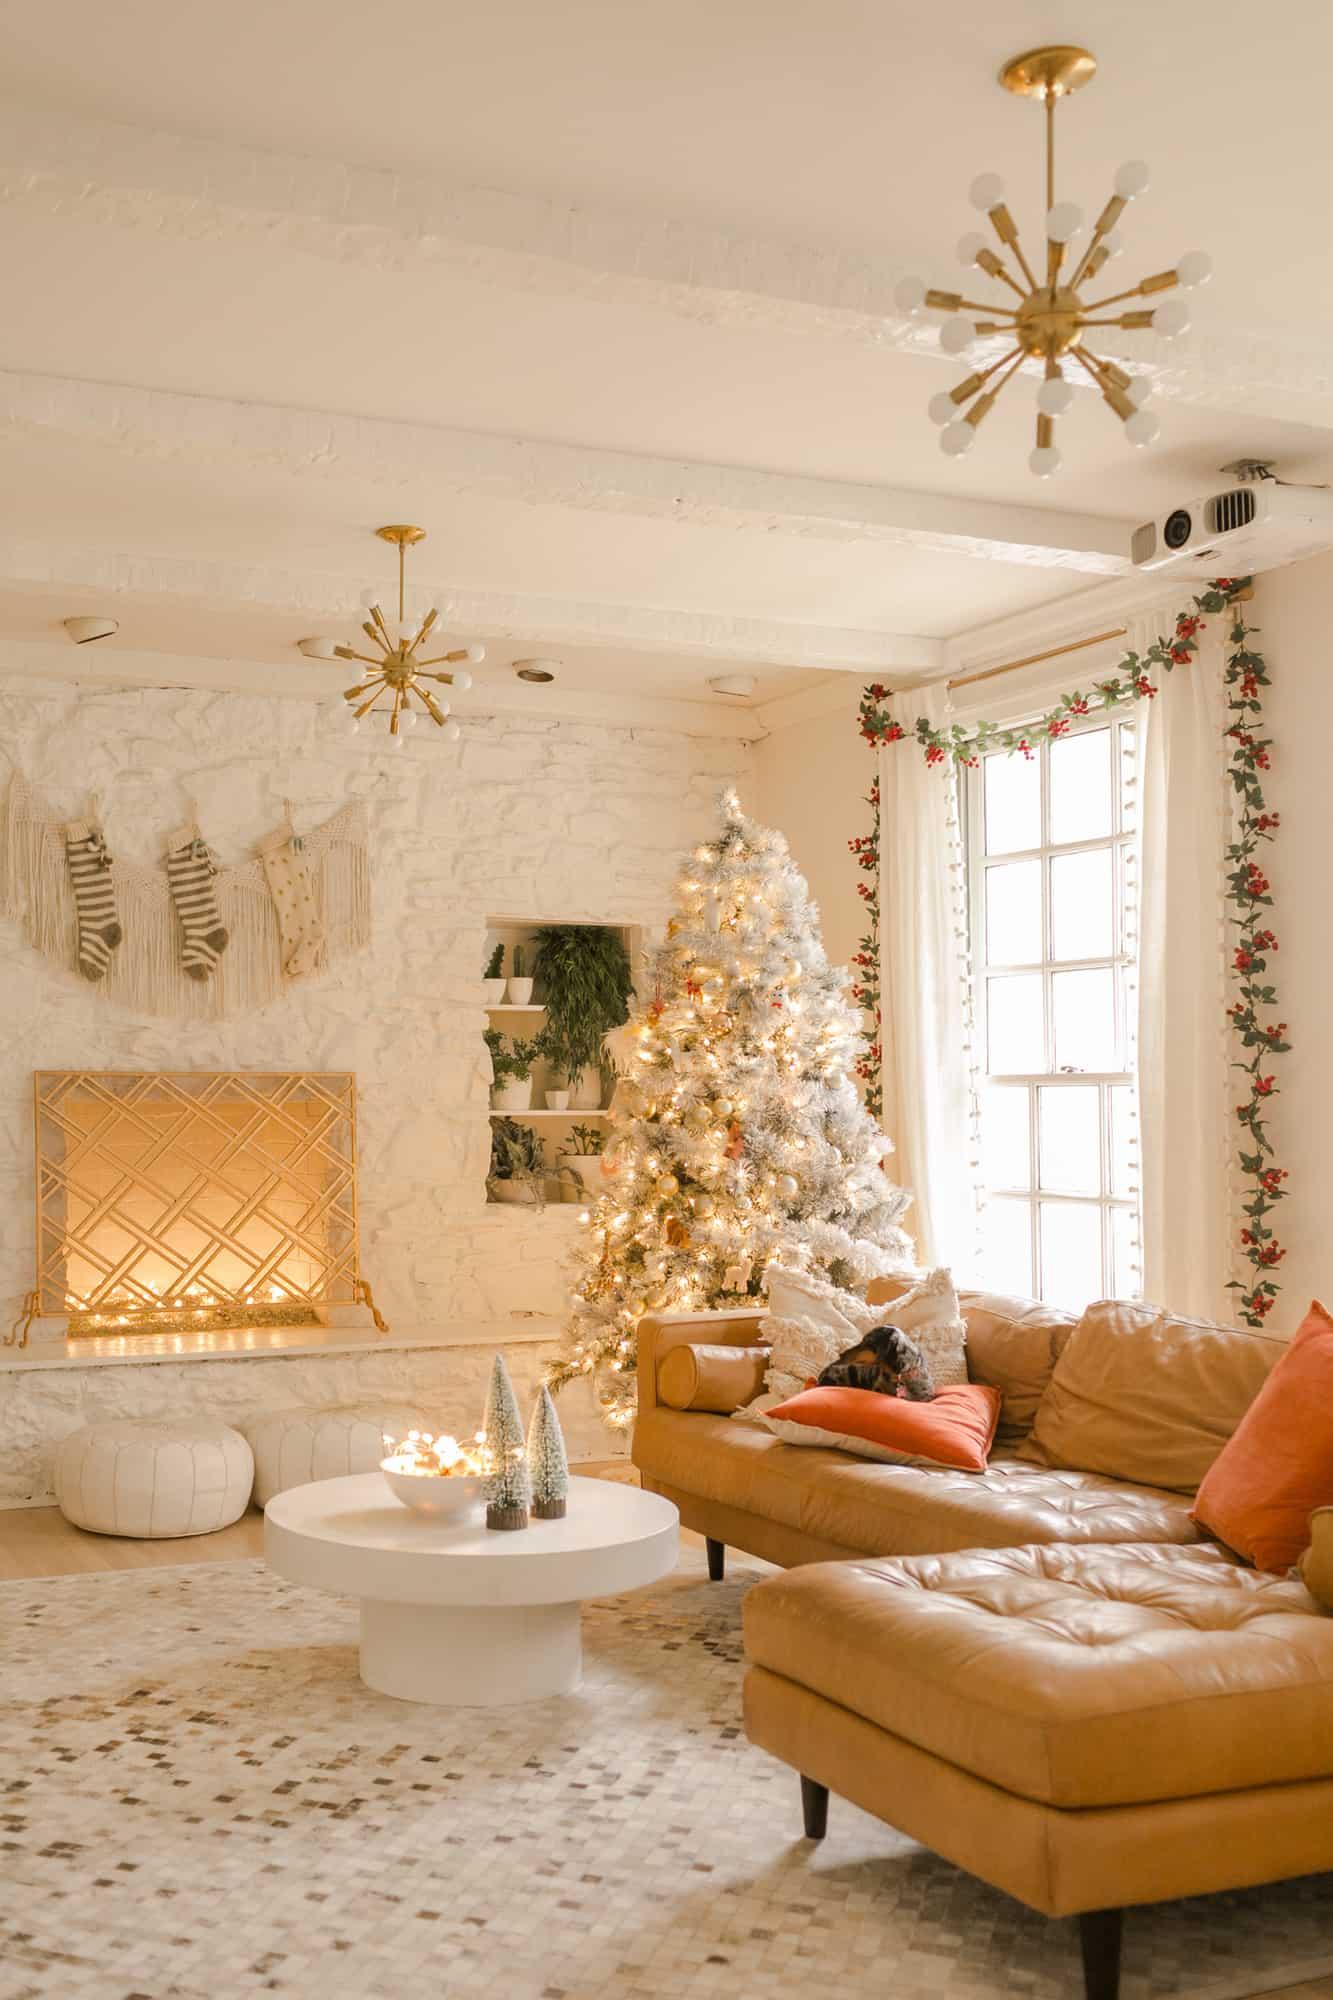 Elsie's Holiday Living Room Tour